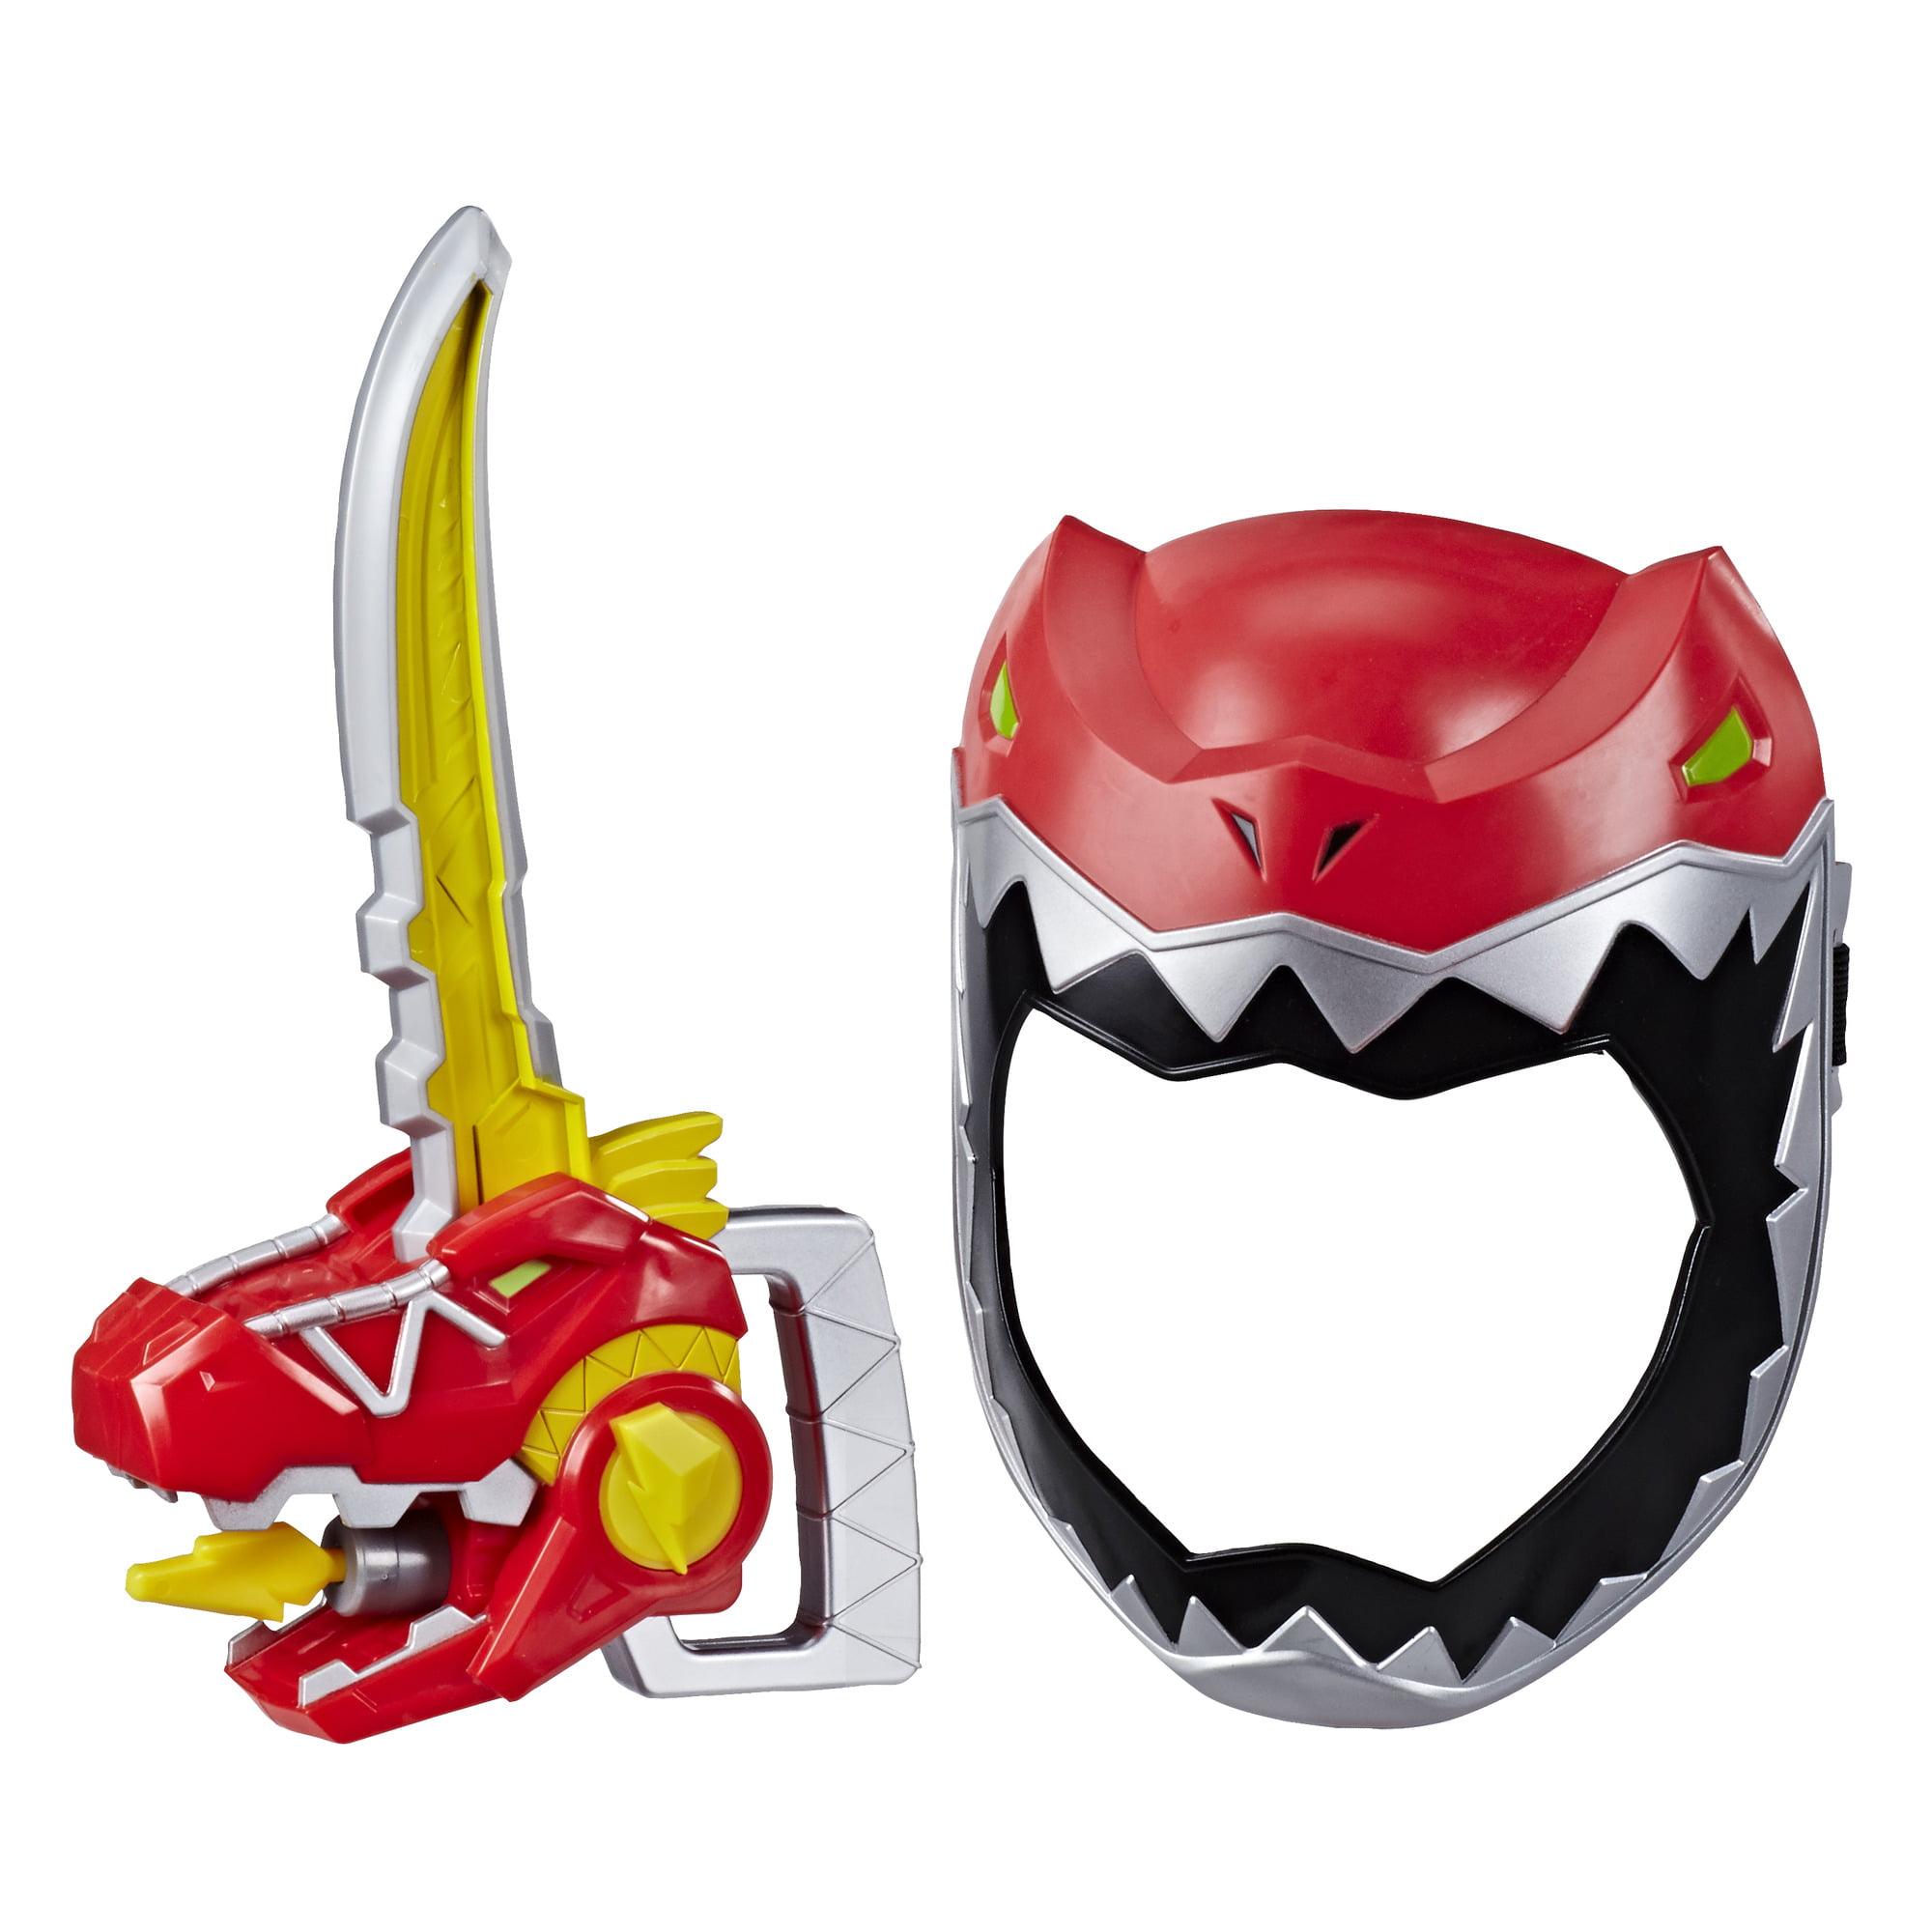 Playskool Heroes Power Rangers Zord Saber Red Ranger Mask With Sword Walmart Com Walmart Com